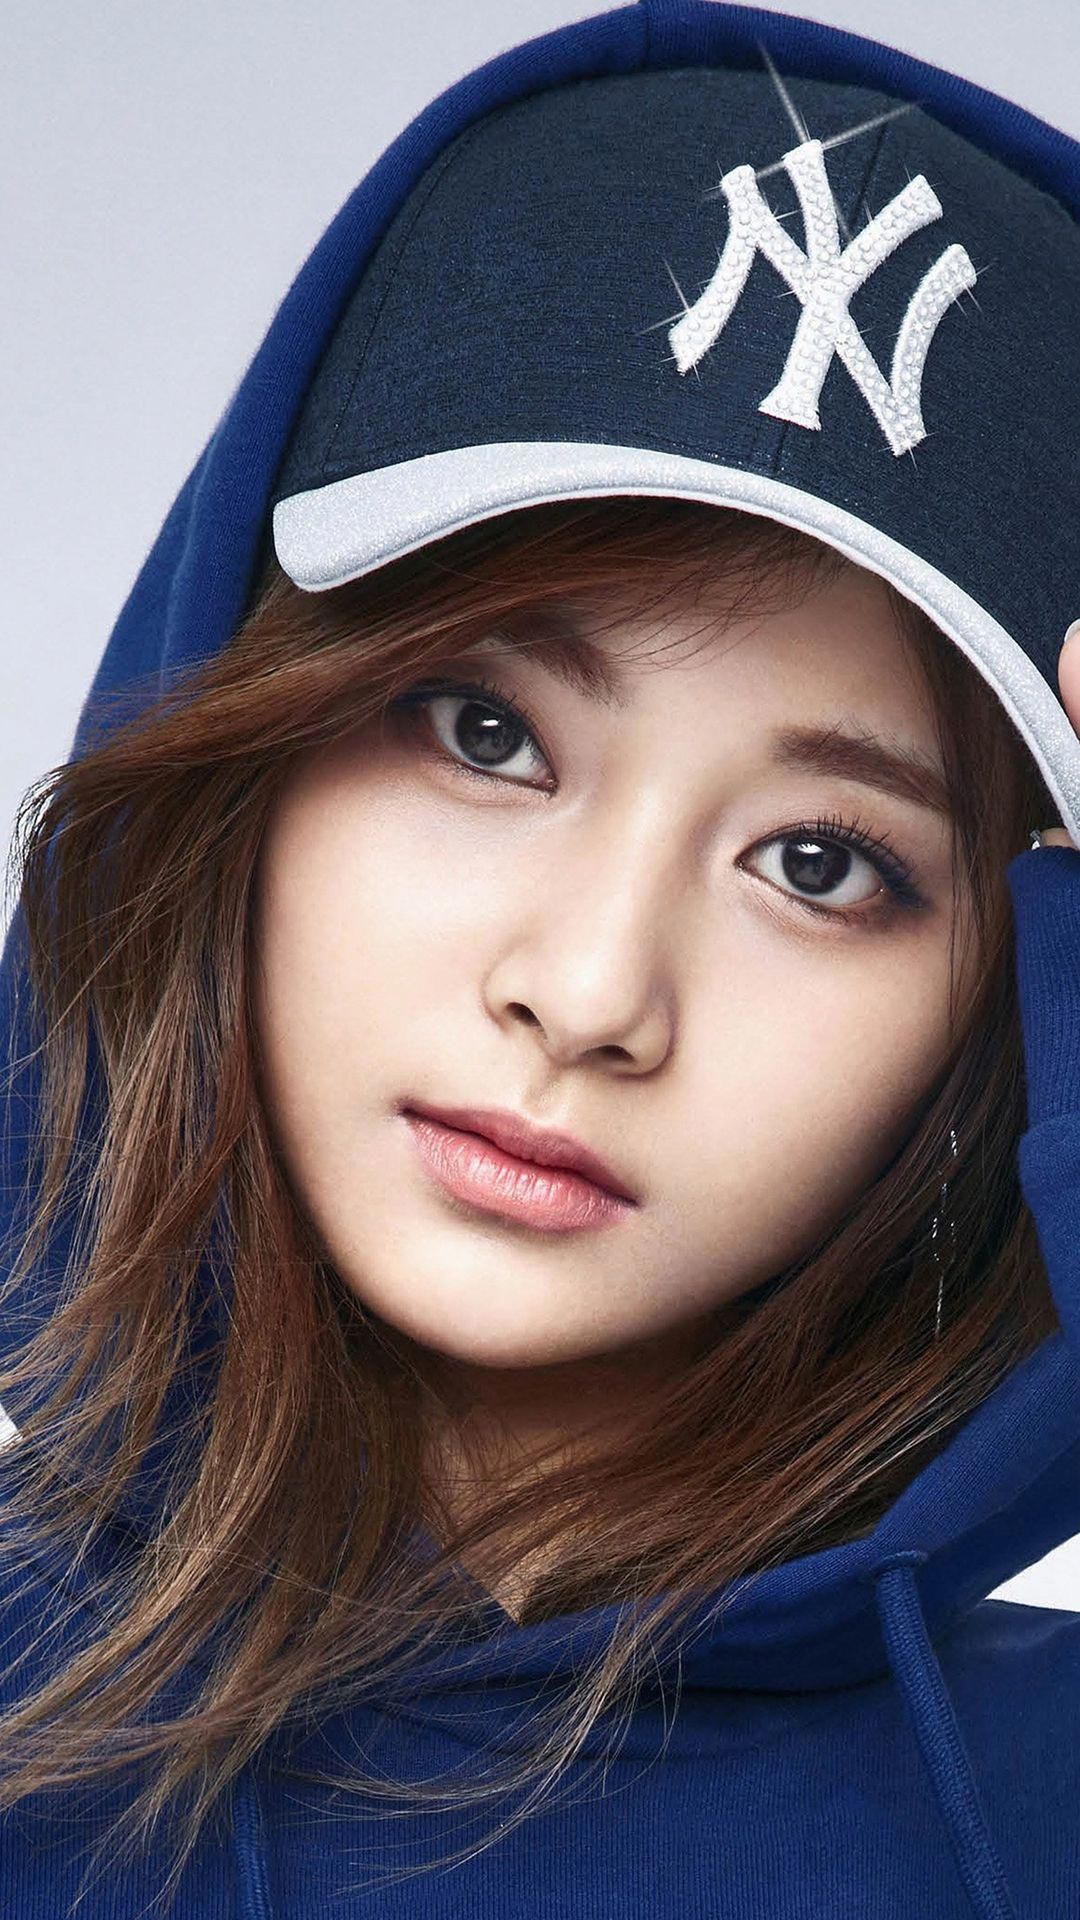 Tzuyu Kpop Girl Idol Face Iphone 6 Wallpaper